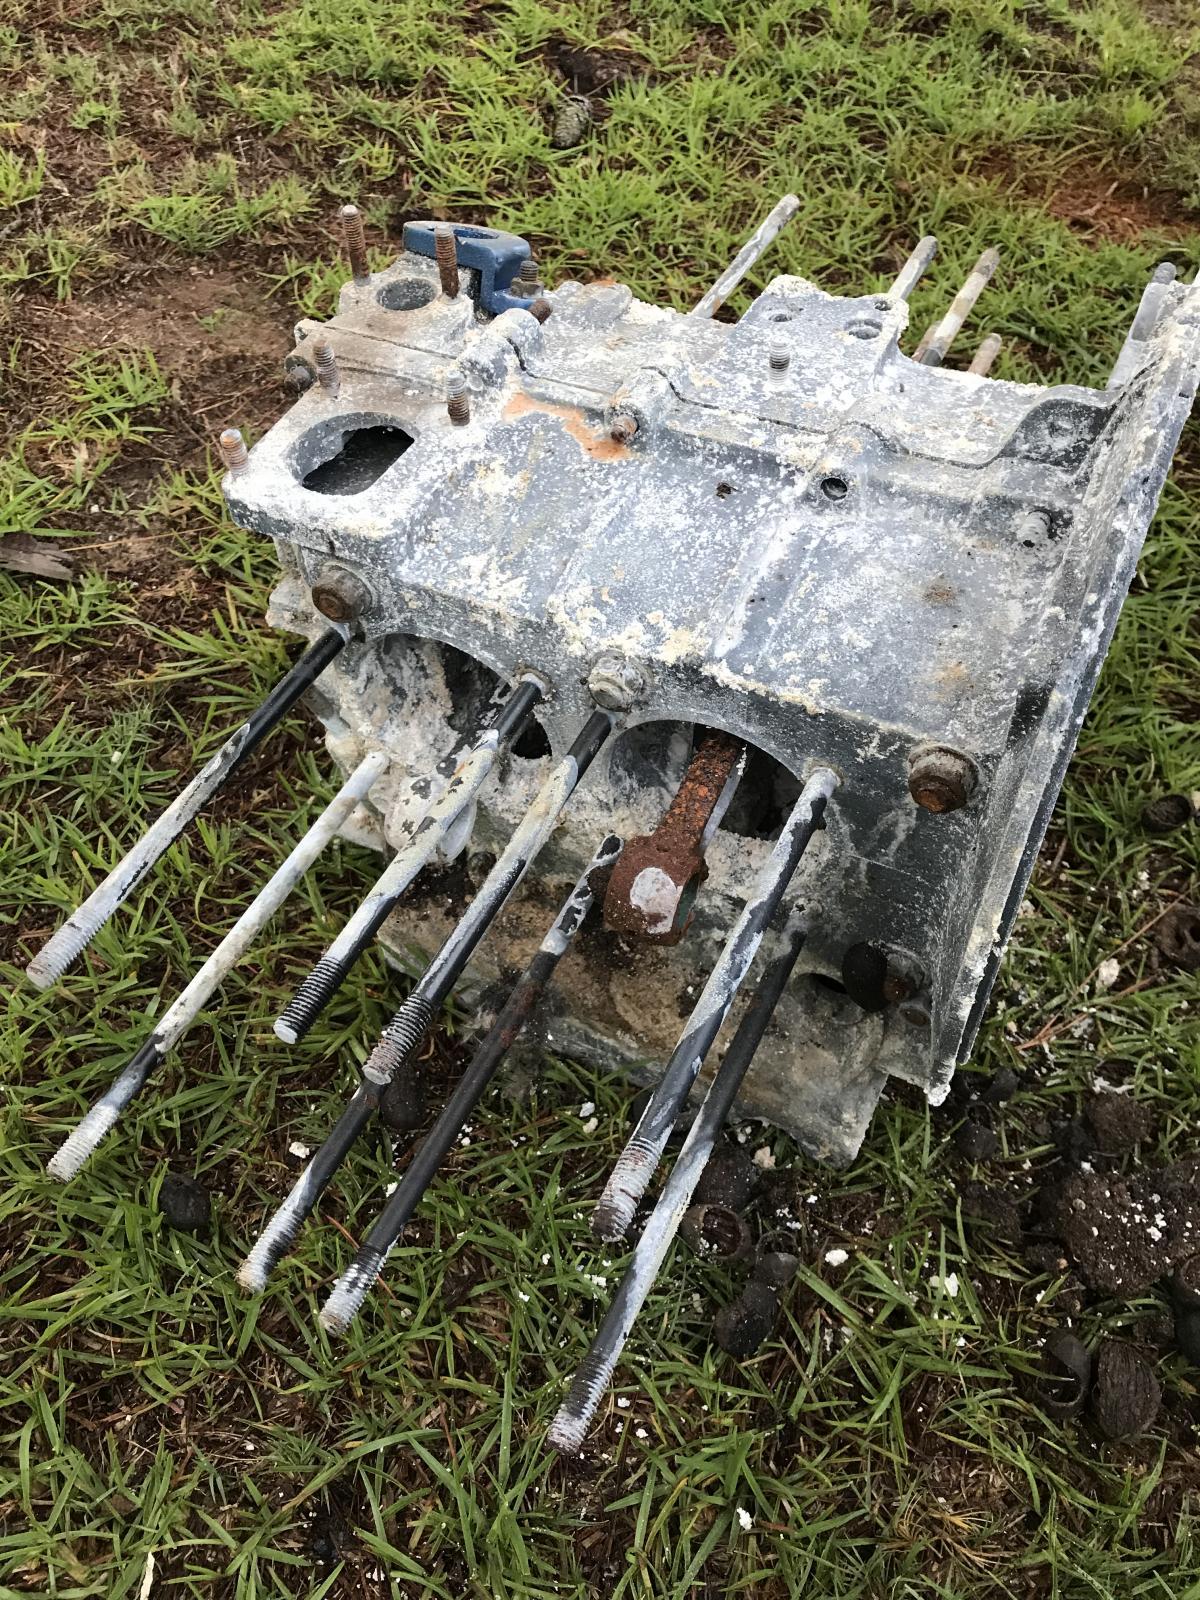 Engine worth saving?